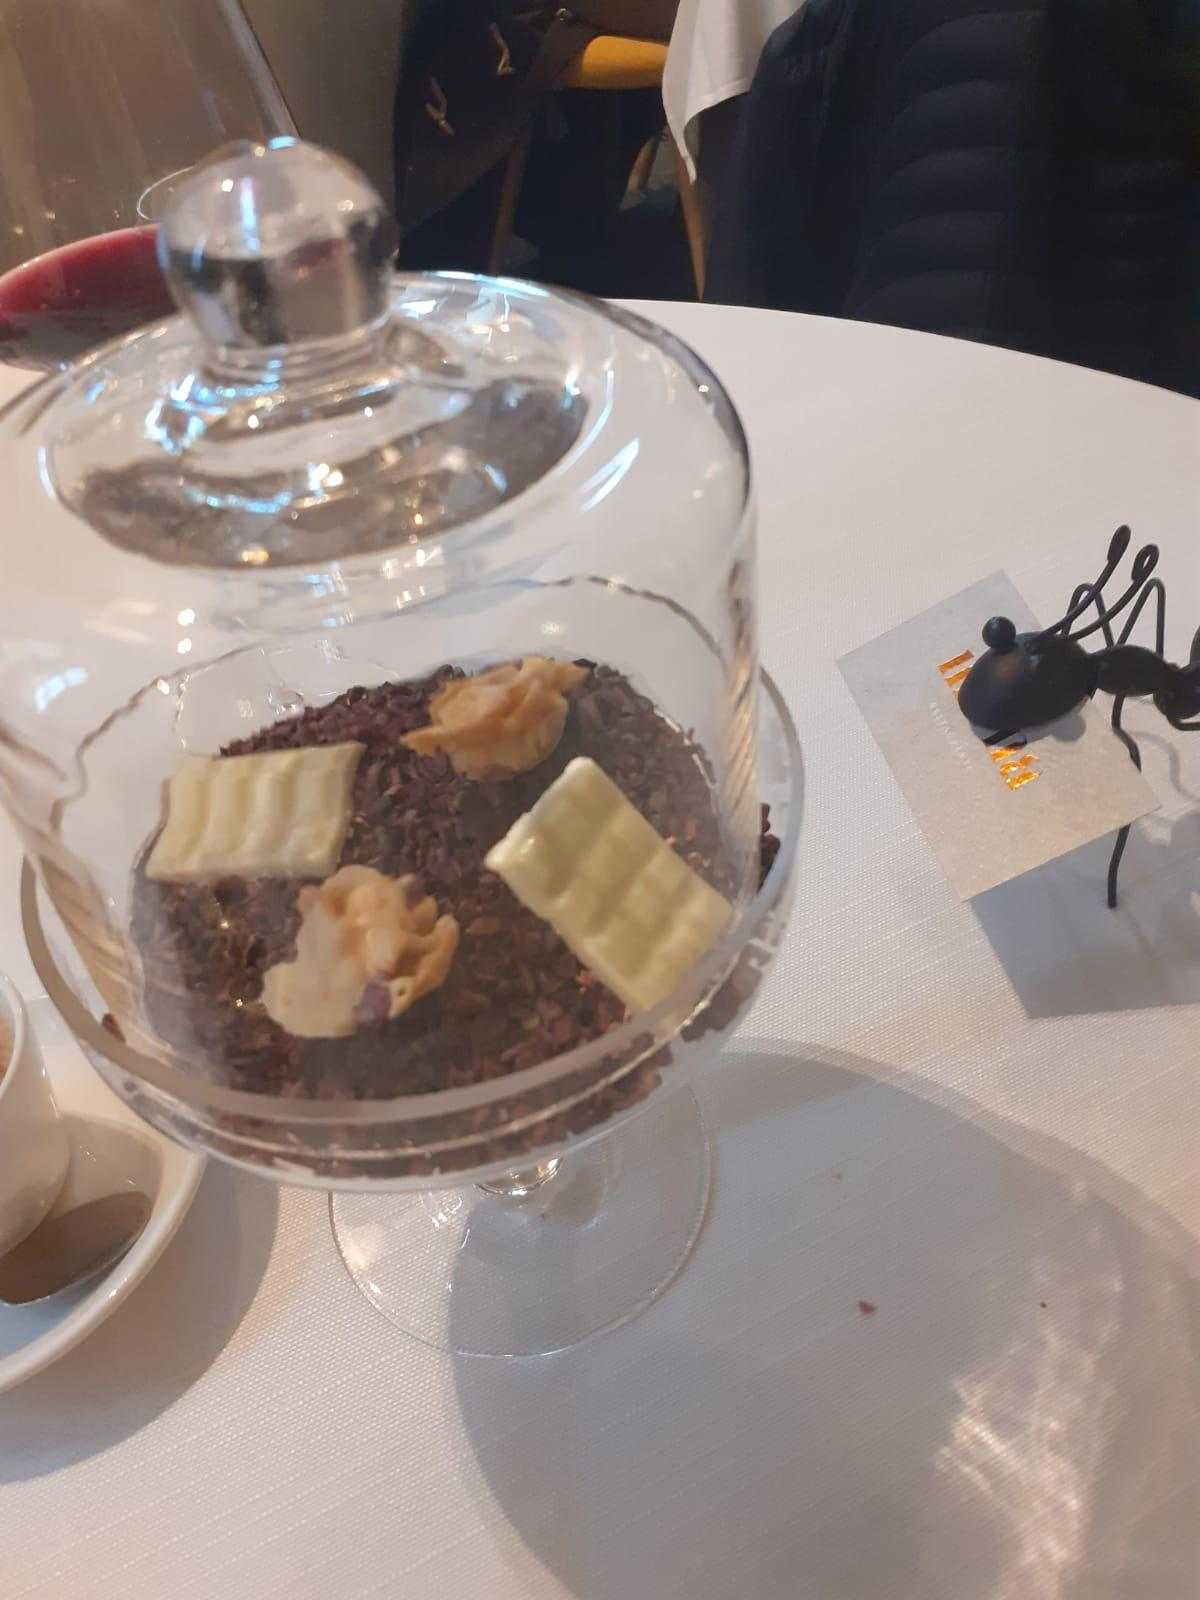 Reseña Gastronómica: Restaurante MU-Na de Ponferrada 3